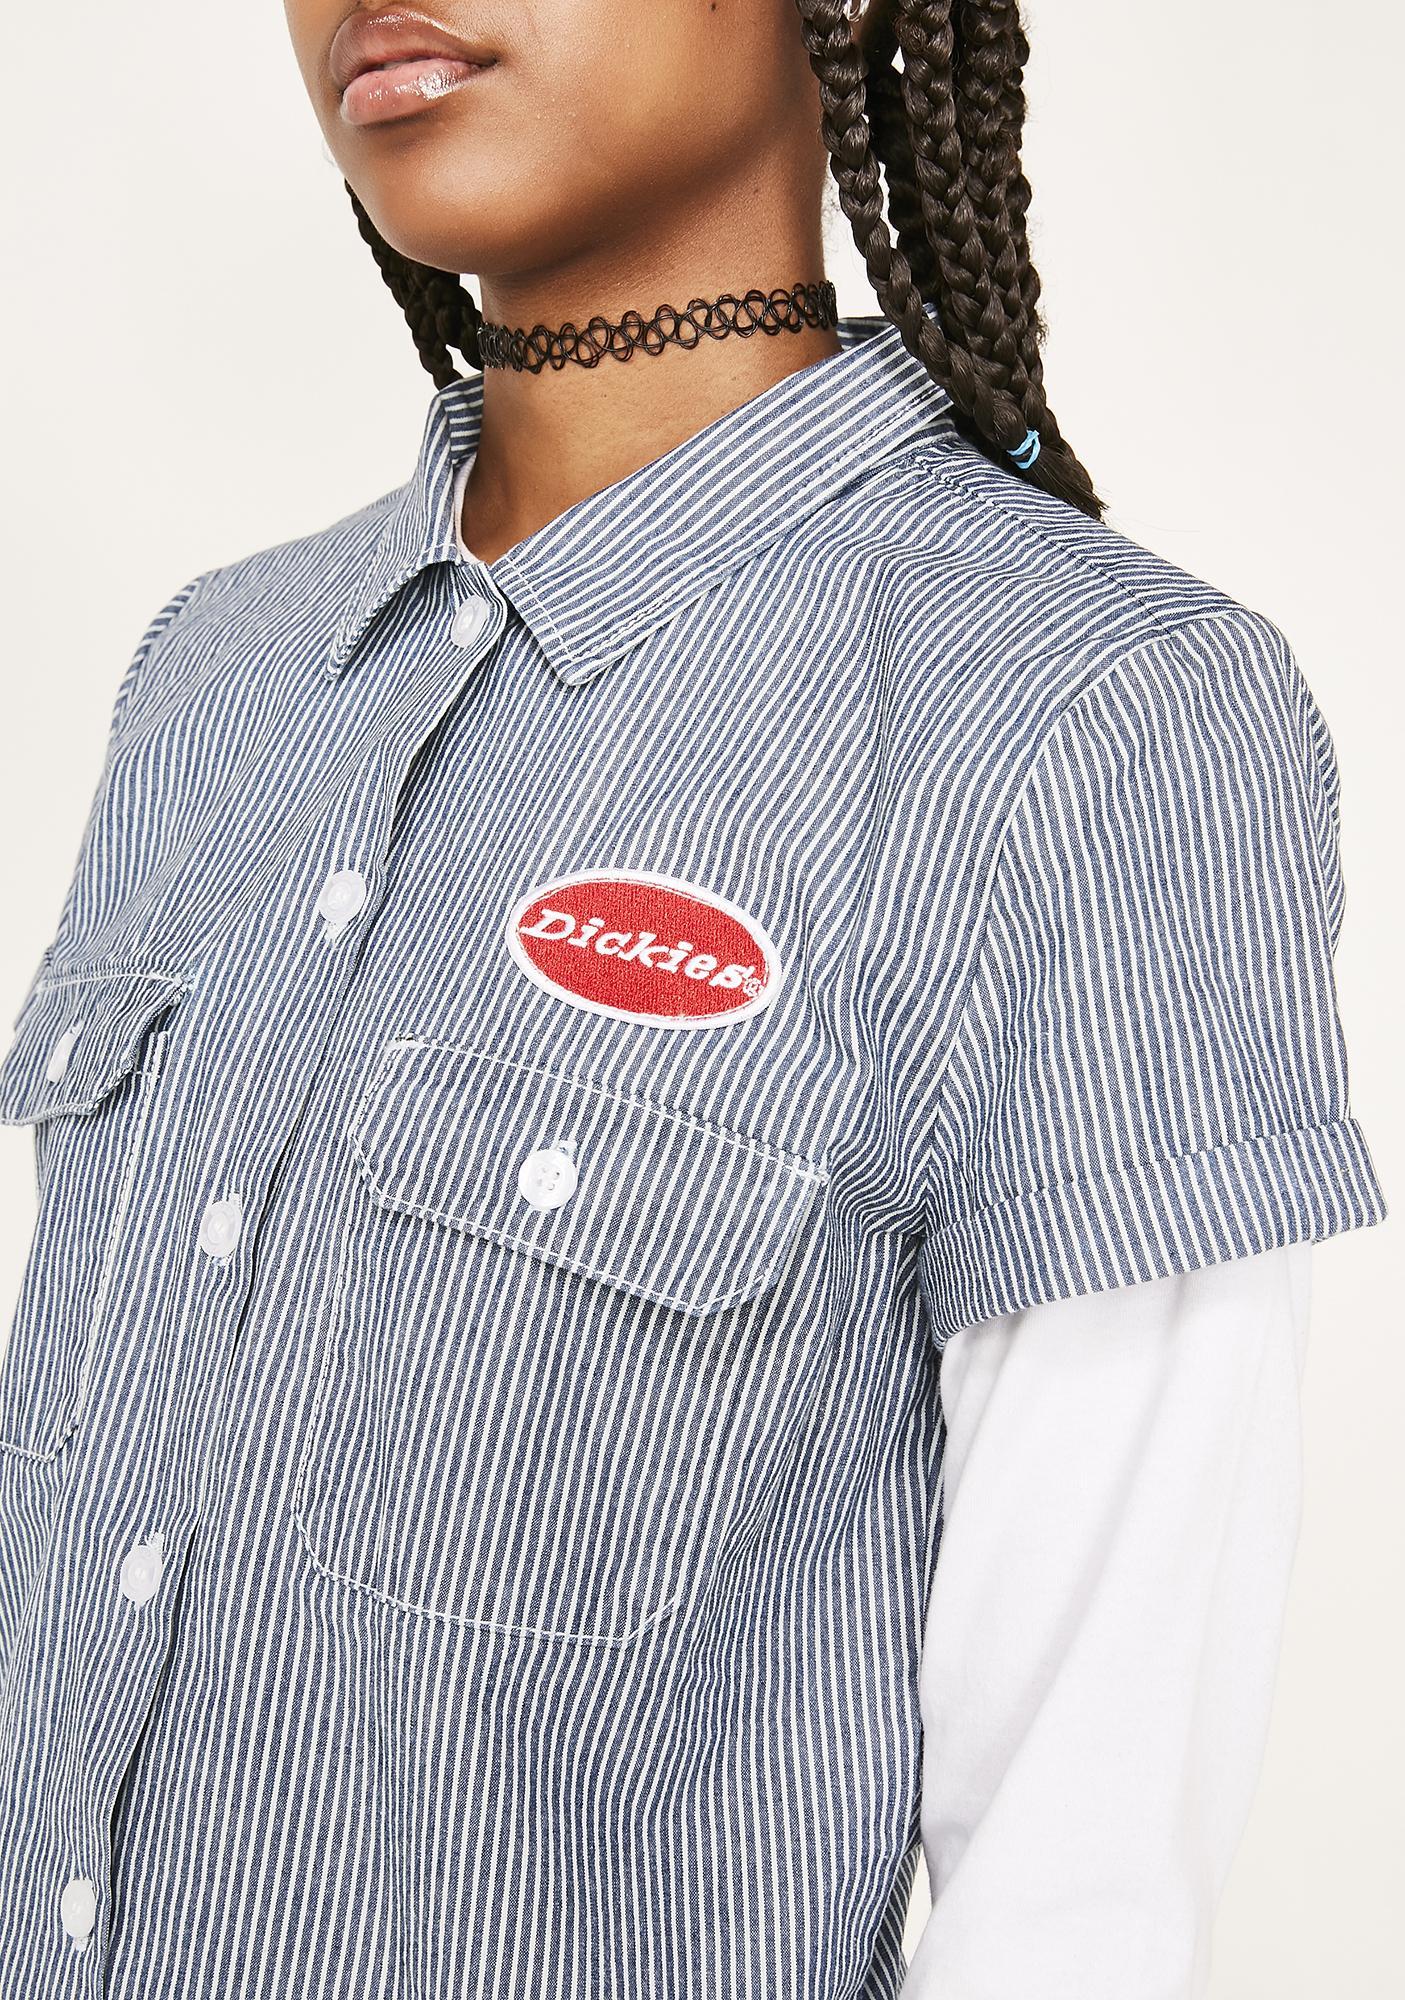 Dickies Girl Patch Work Shirt